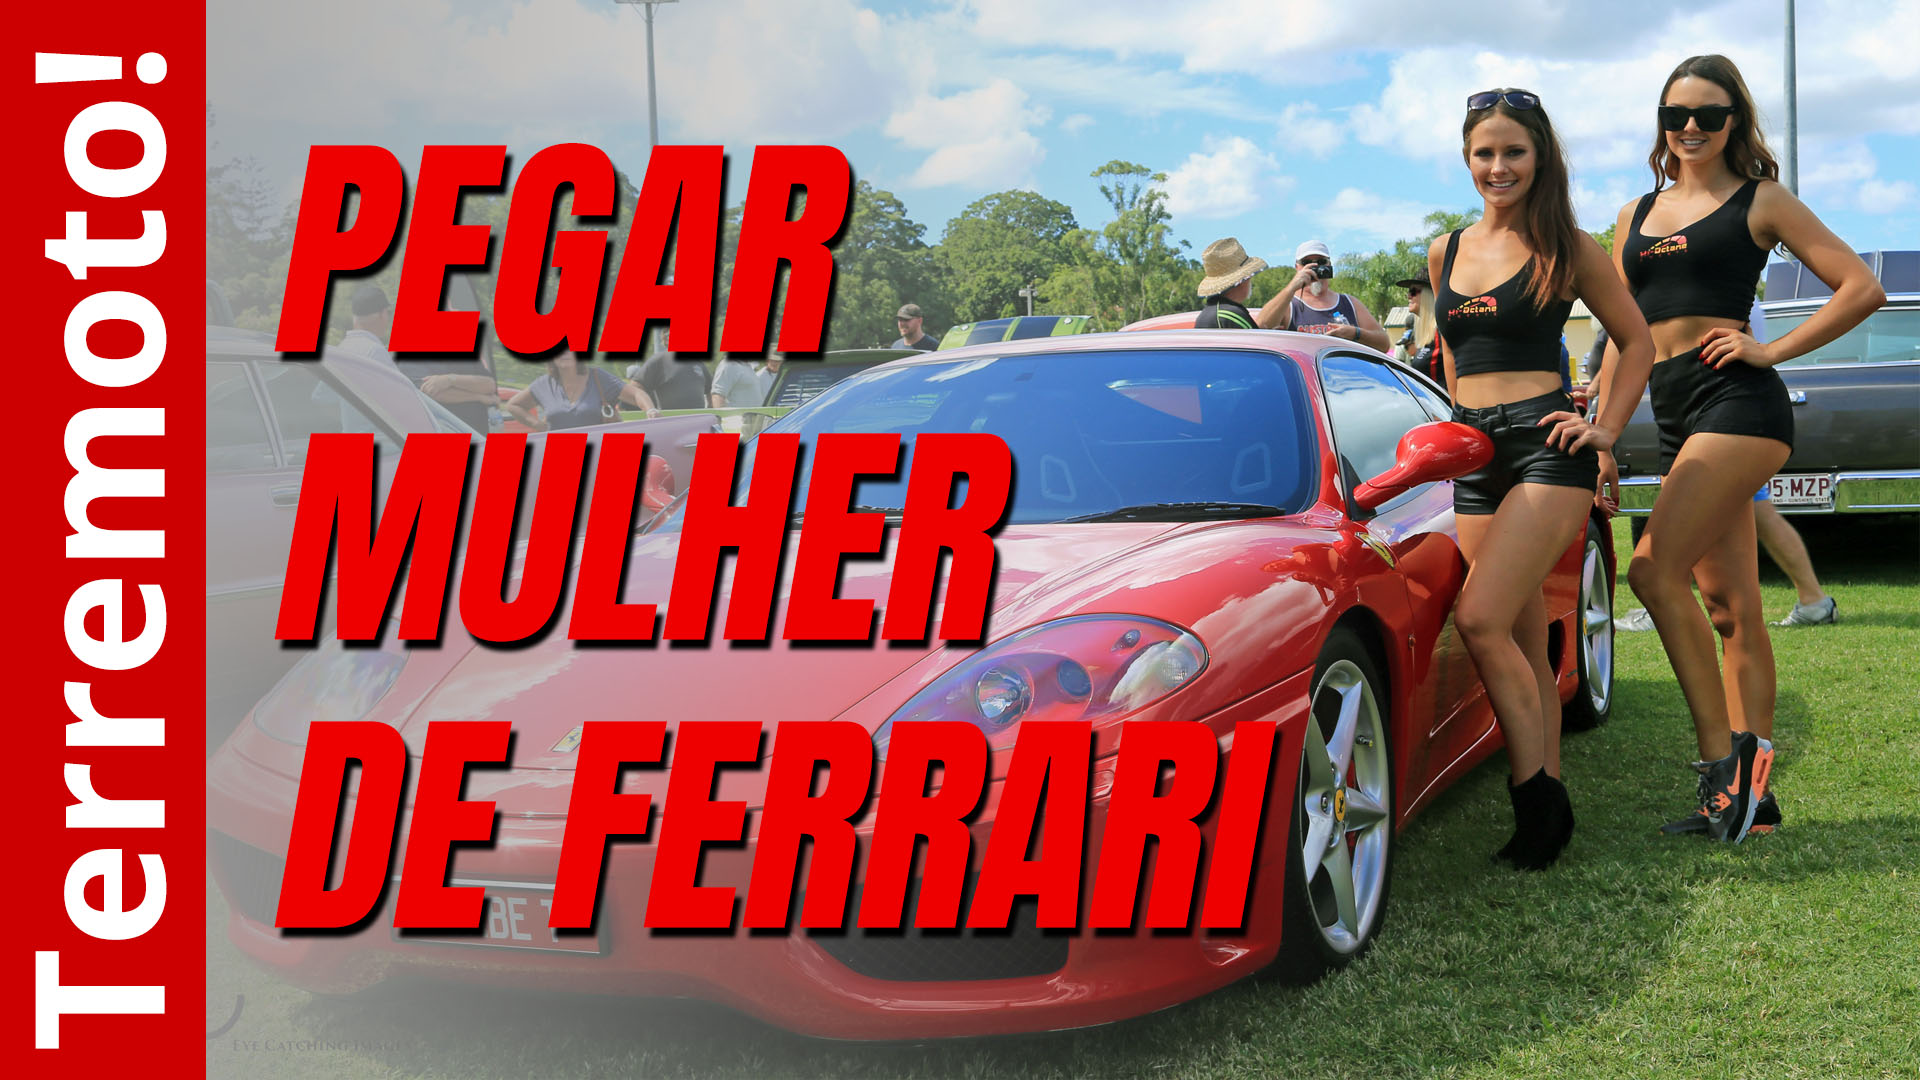 Pegar mulher de Ferrari